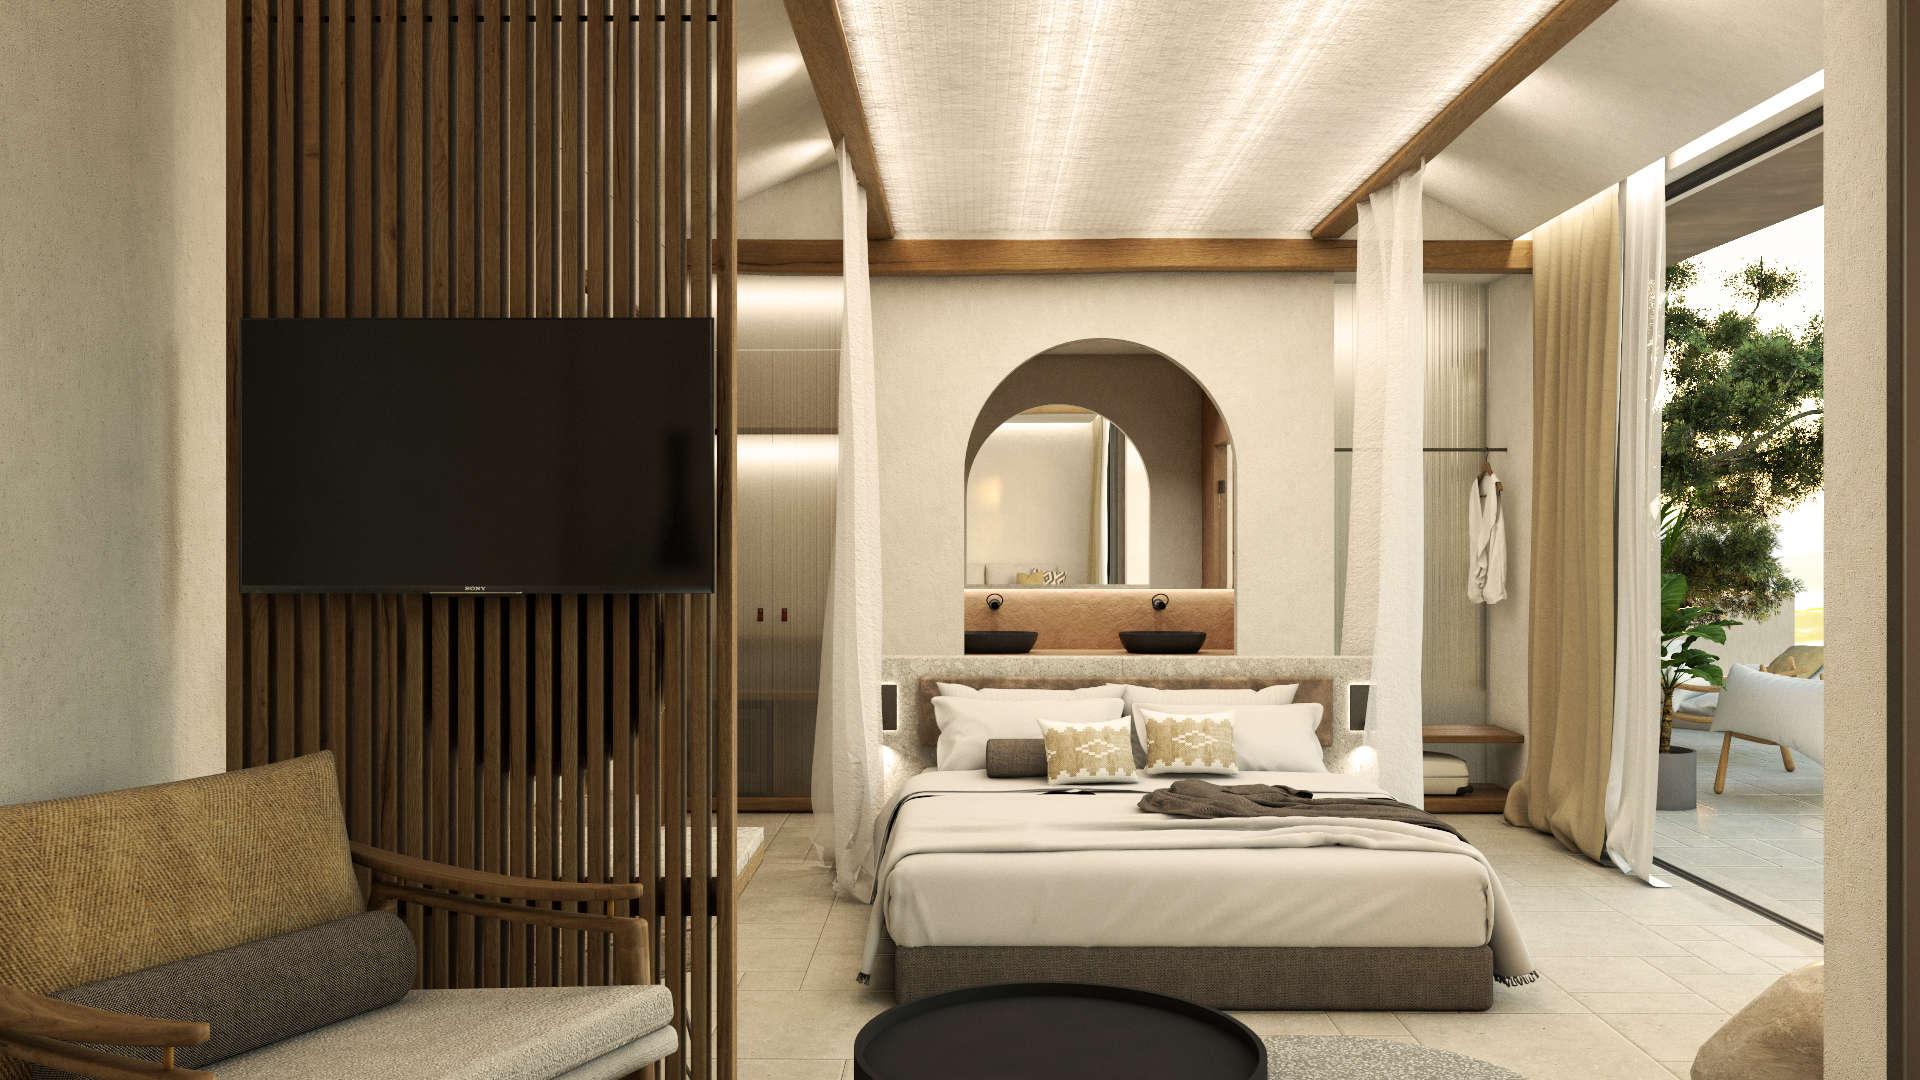 Interior design, Luxury suite, bed, living room. Διακόσμηση, Πολυτελής σουίτα. Κρεβάτι, καθιστικό.